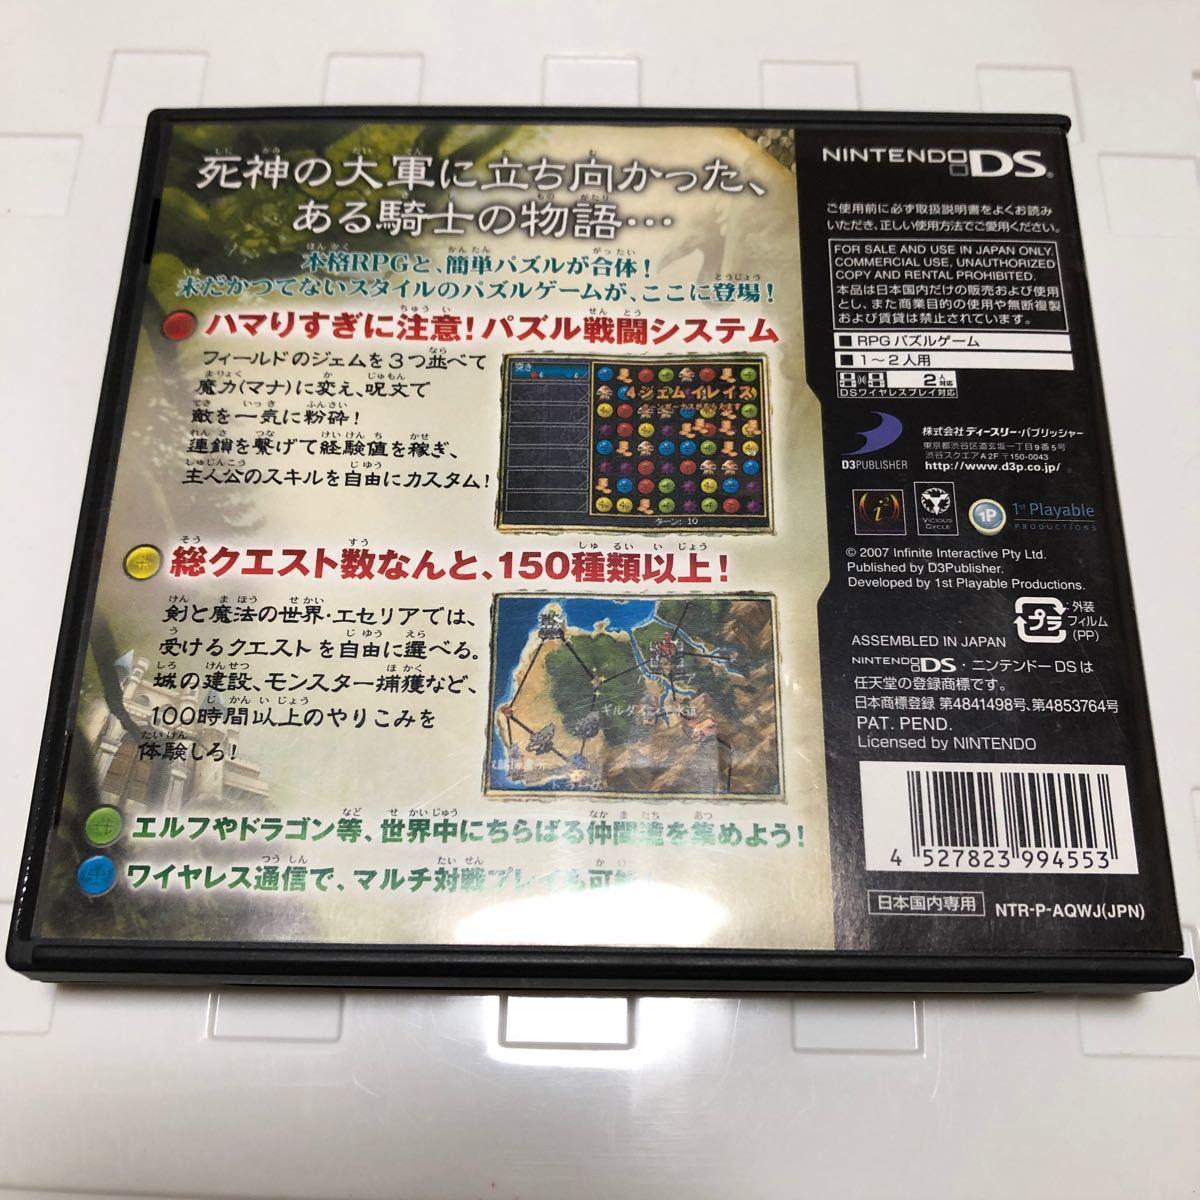 Nintendo DS SIMPLE DSシリーズ Vol.23 THE パズルクエスト  アガリアの騎士